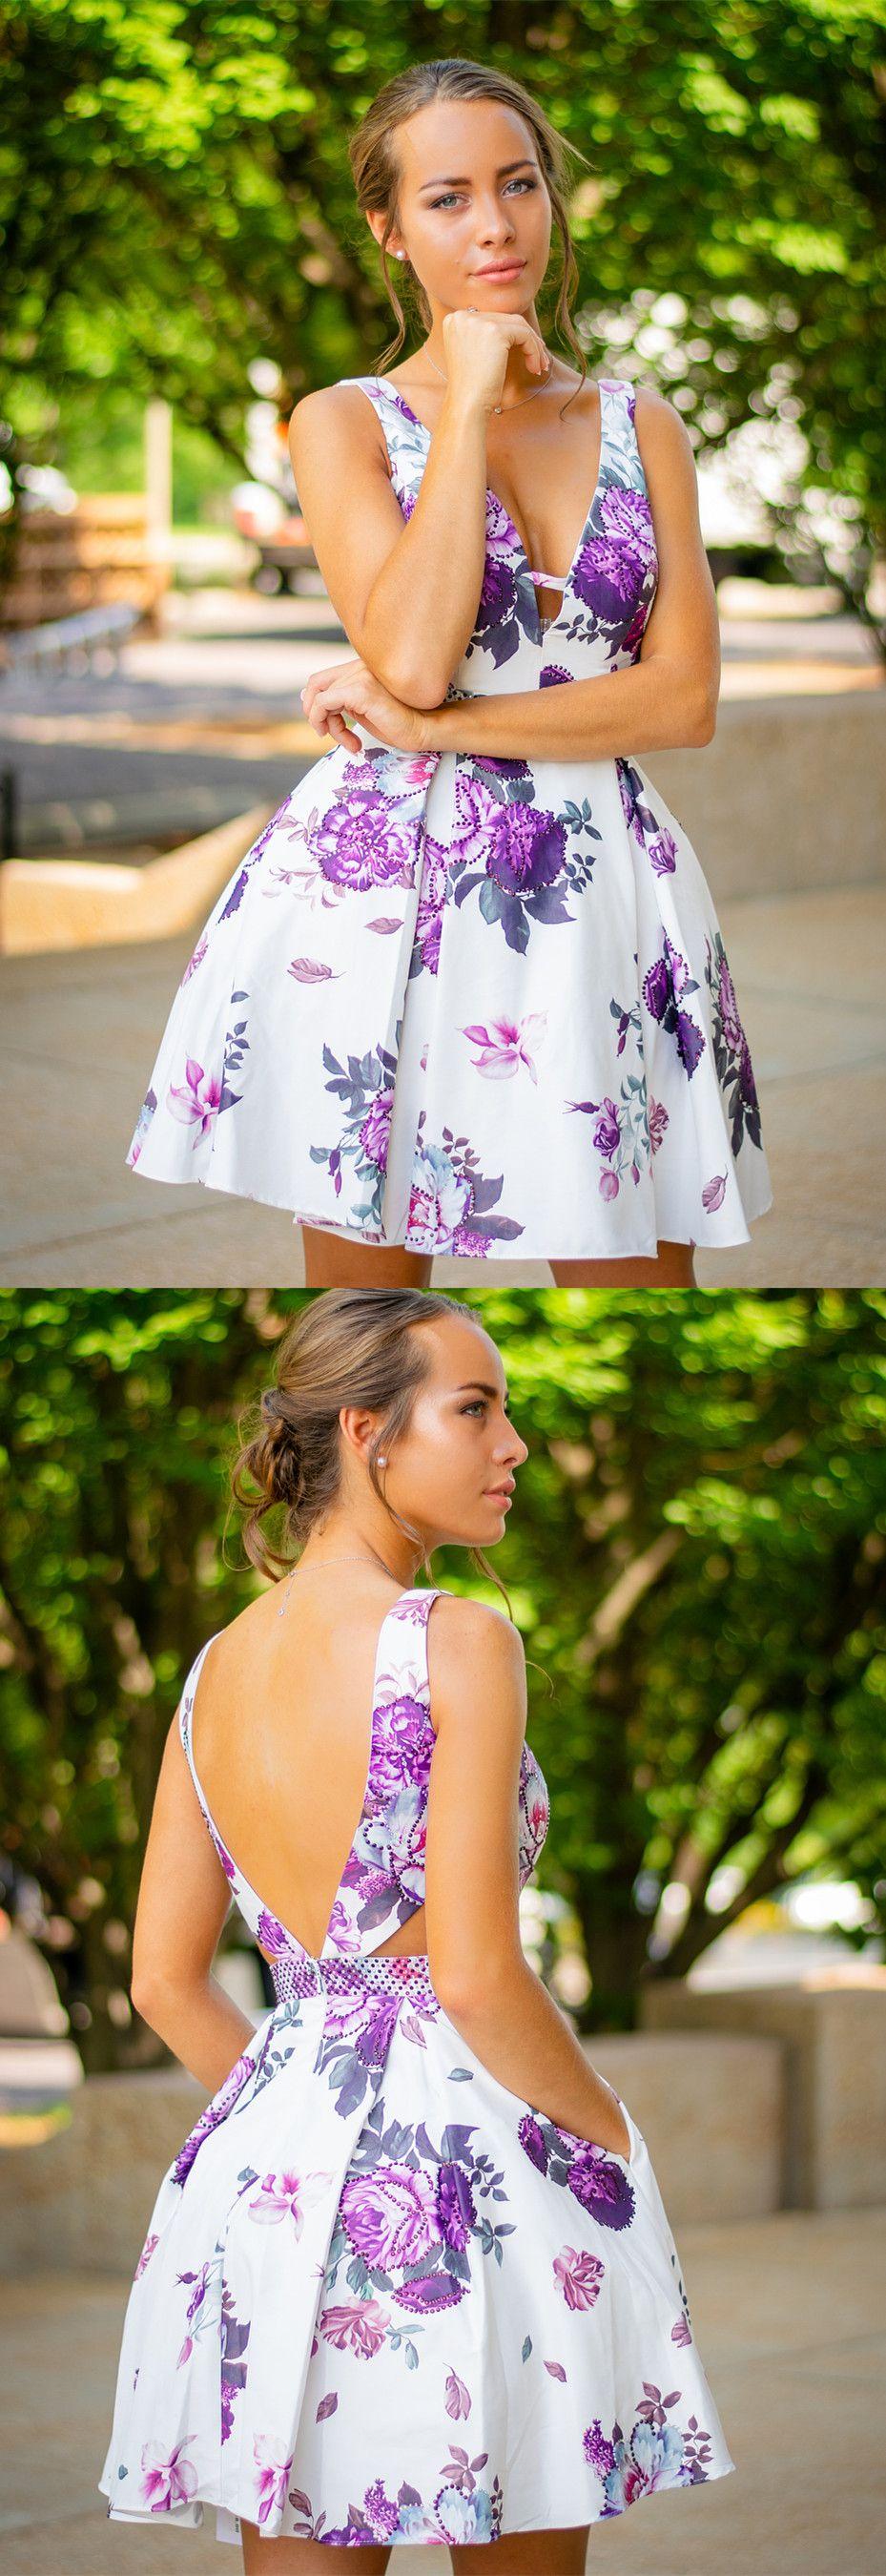 Short floral homecoming dresses homecoming dresses homecoming